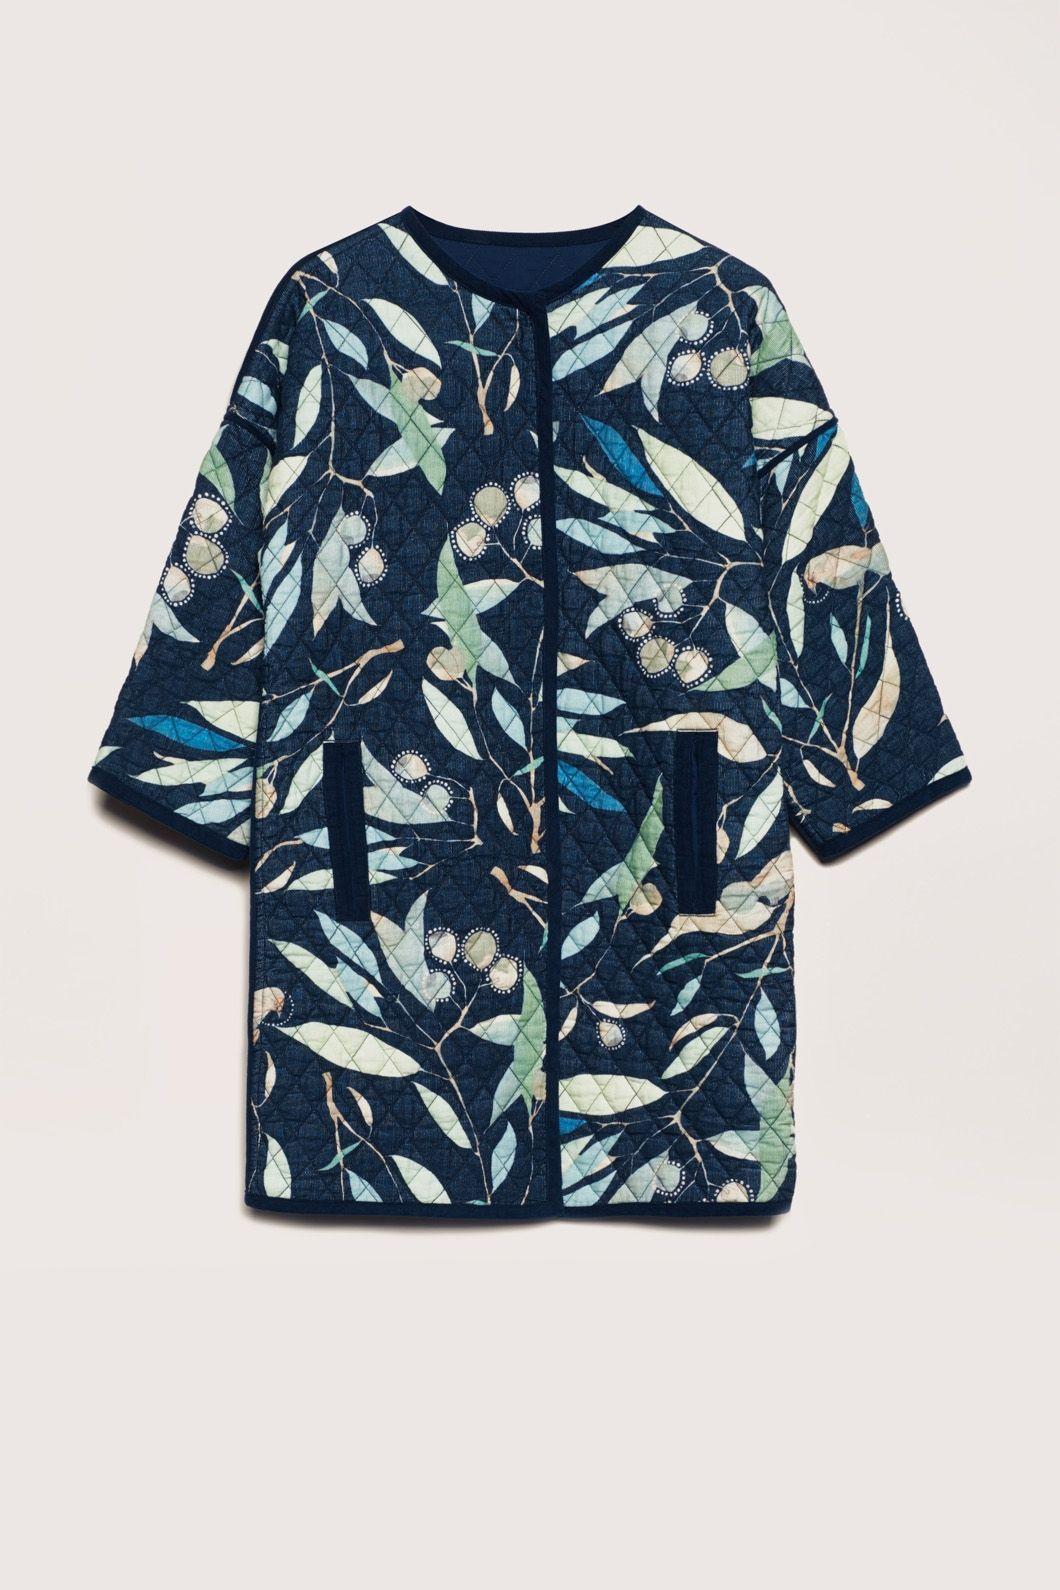 95868c45f Gorman clothing - Gorman x Dana Kinter - Thornbill quilted coat ...